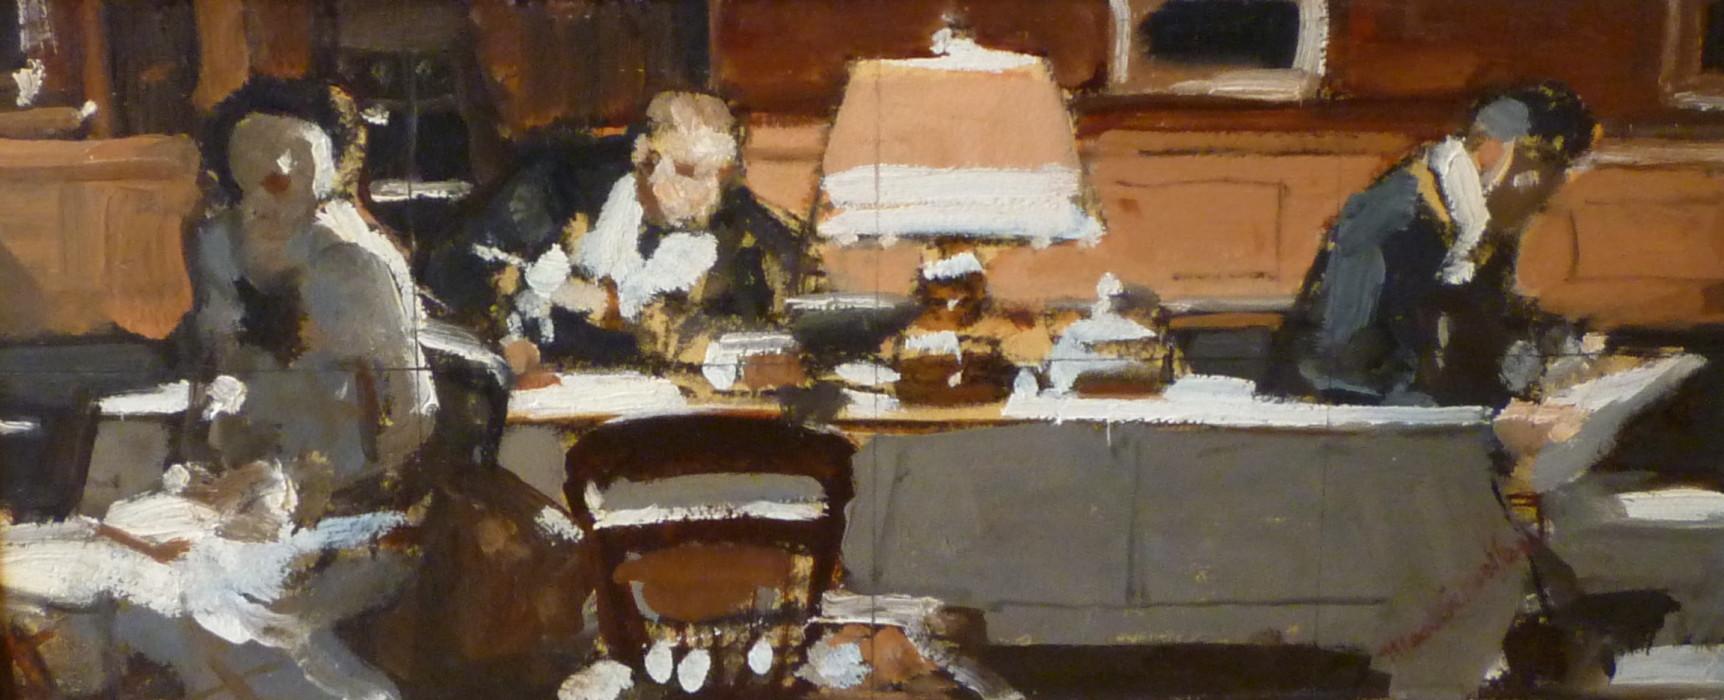 Mead Schaeffer, Men at Desk, oil on illustration board, 6 x 13 1/2 inches